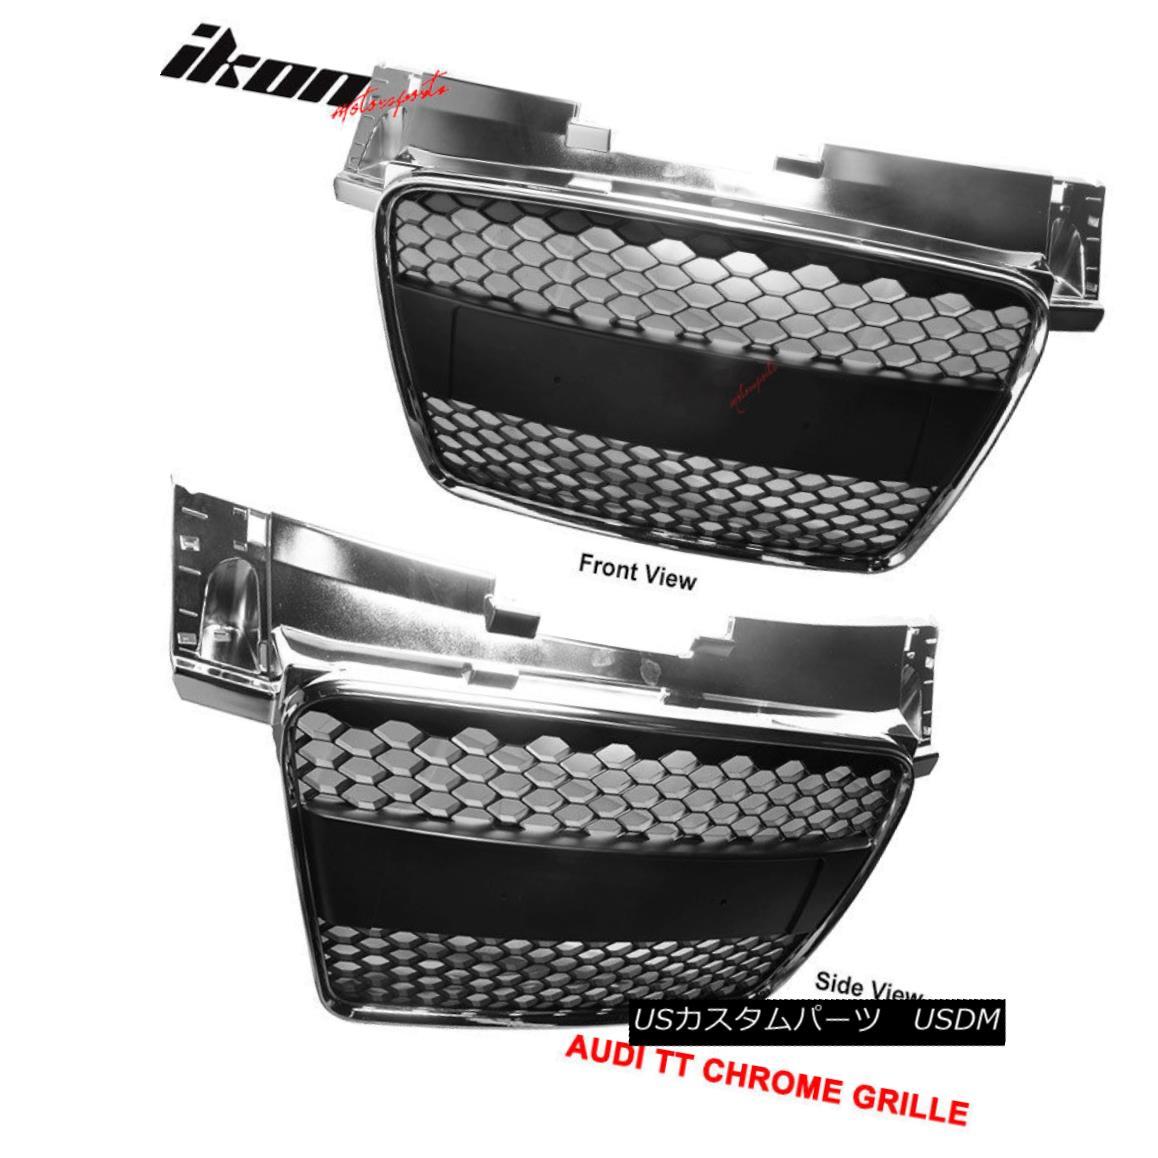 USグリル Fits 06-09 Audi TT ABS Front Hood Grille Grill Chrome Mesh フィット06-09アウディTT ABSフロントフードグリルグリルクロムメッシュ